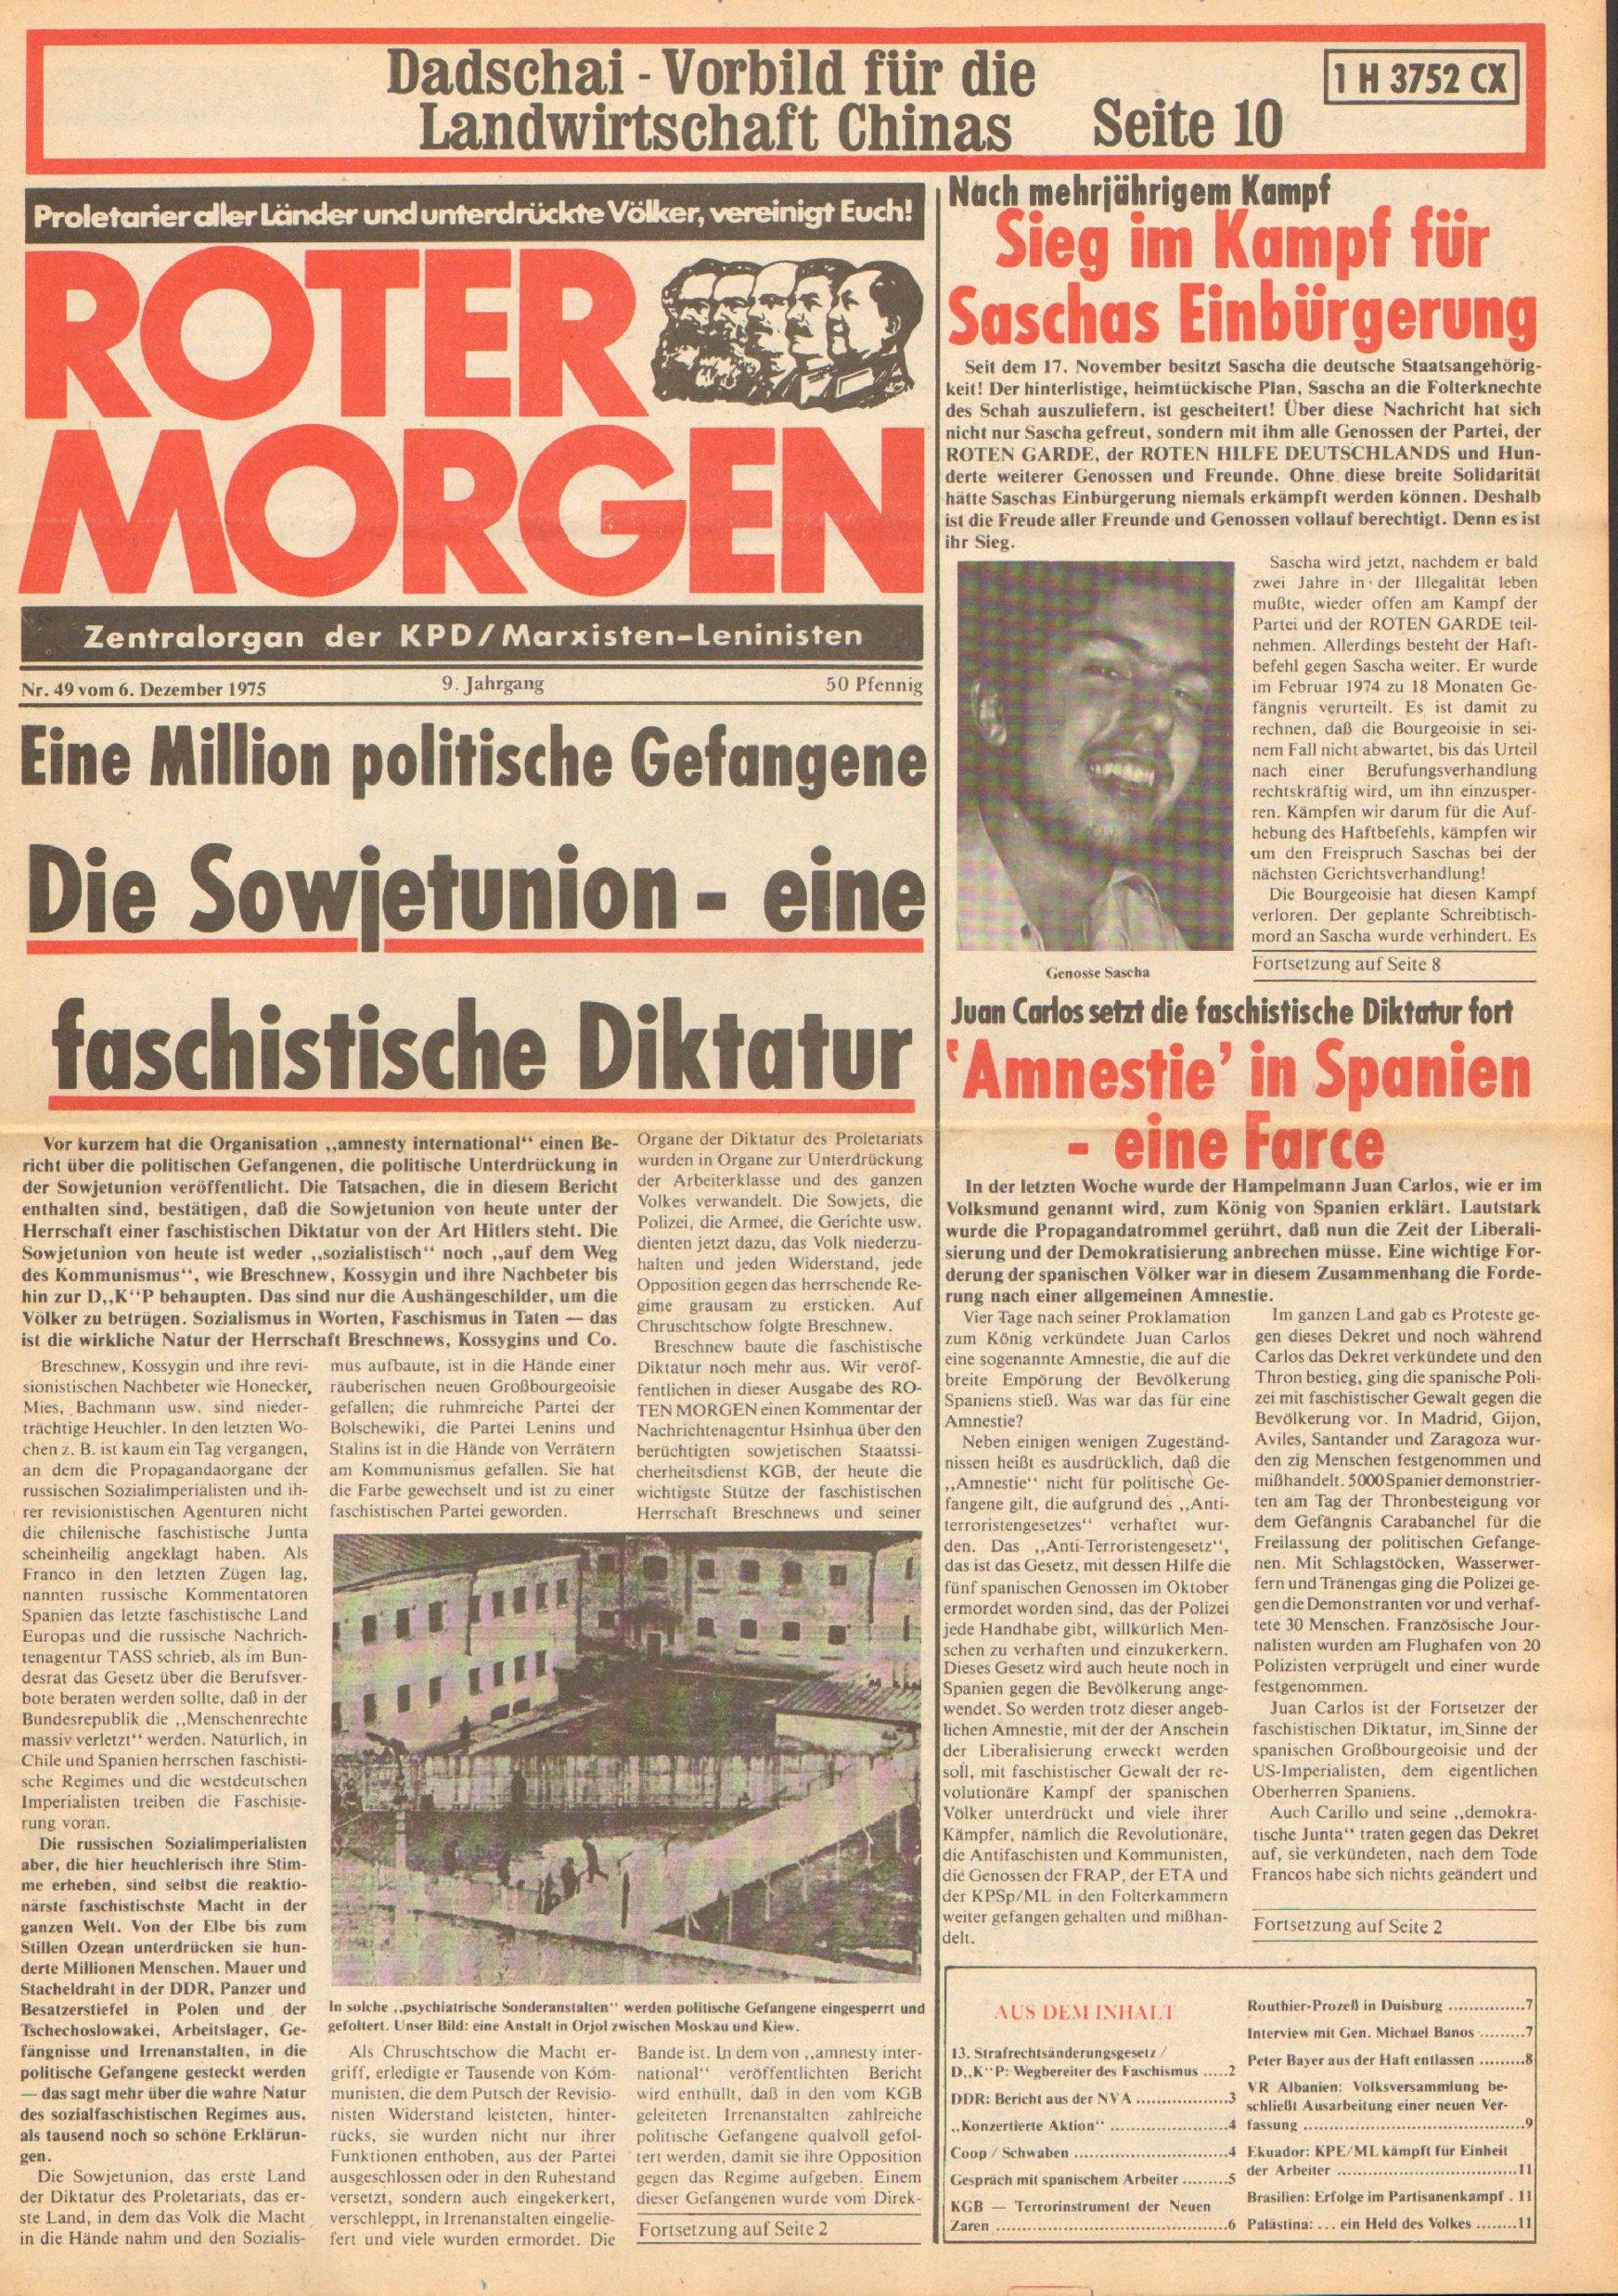 Roter Morgen, 9. Jg., 6. Dezember 1975, Nr. 49, Seite 1